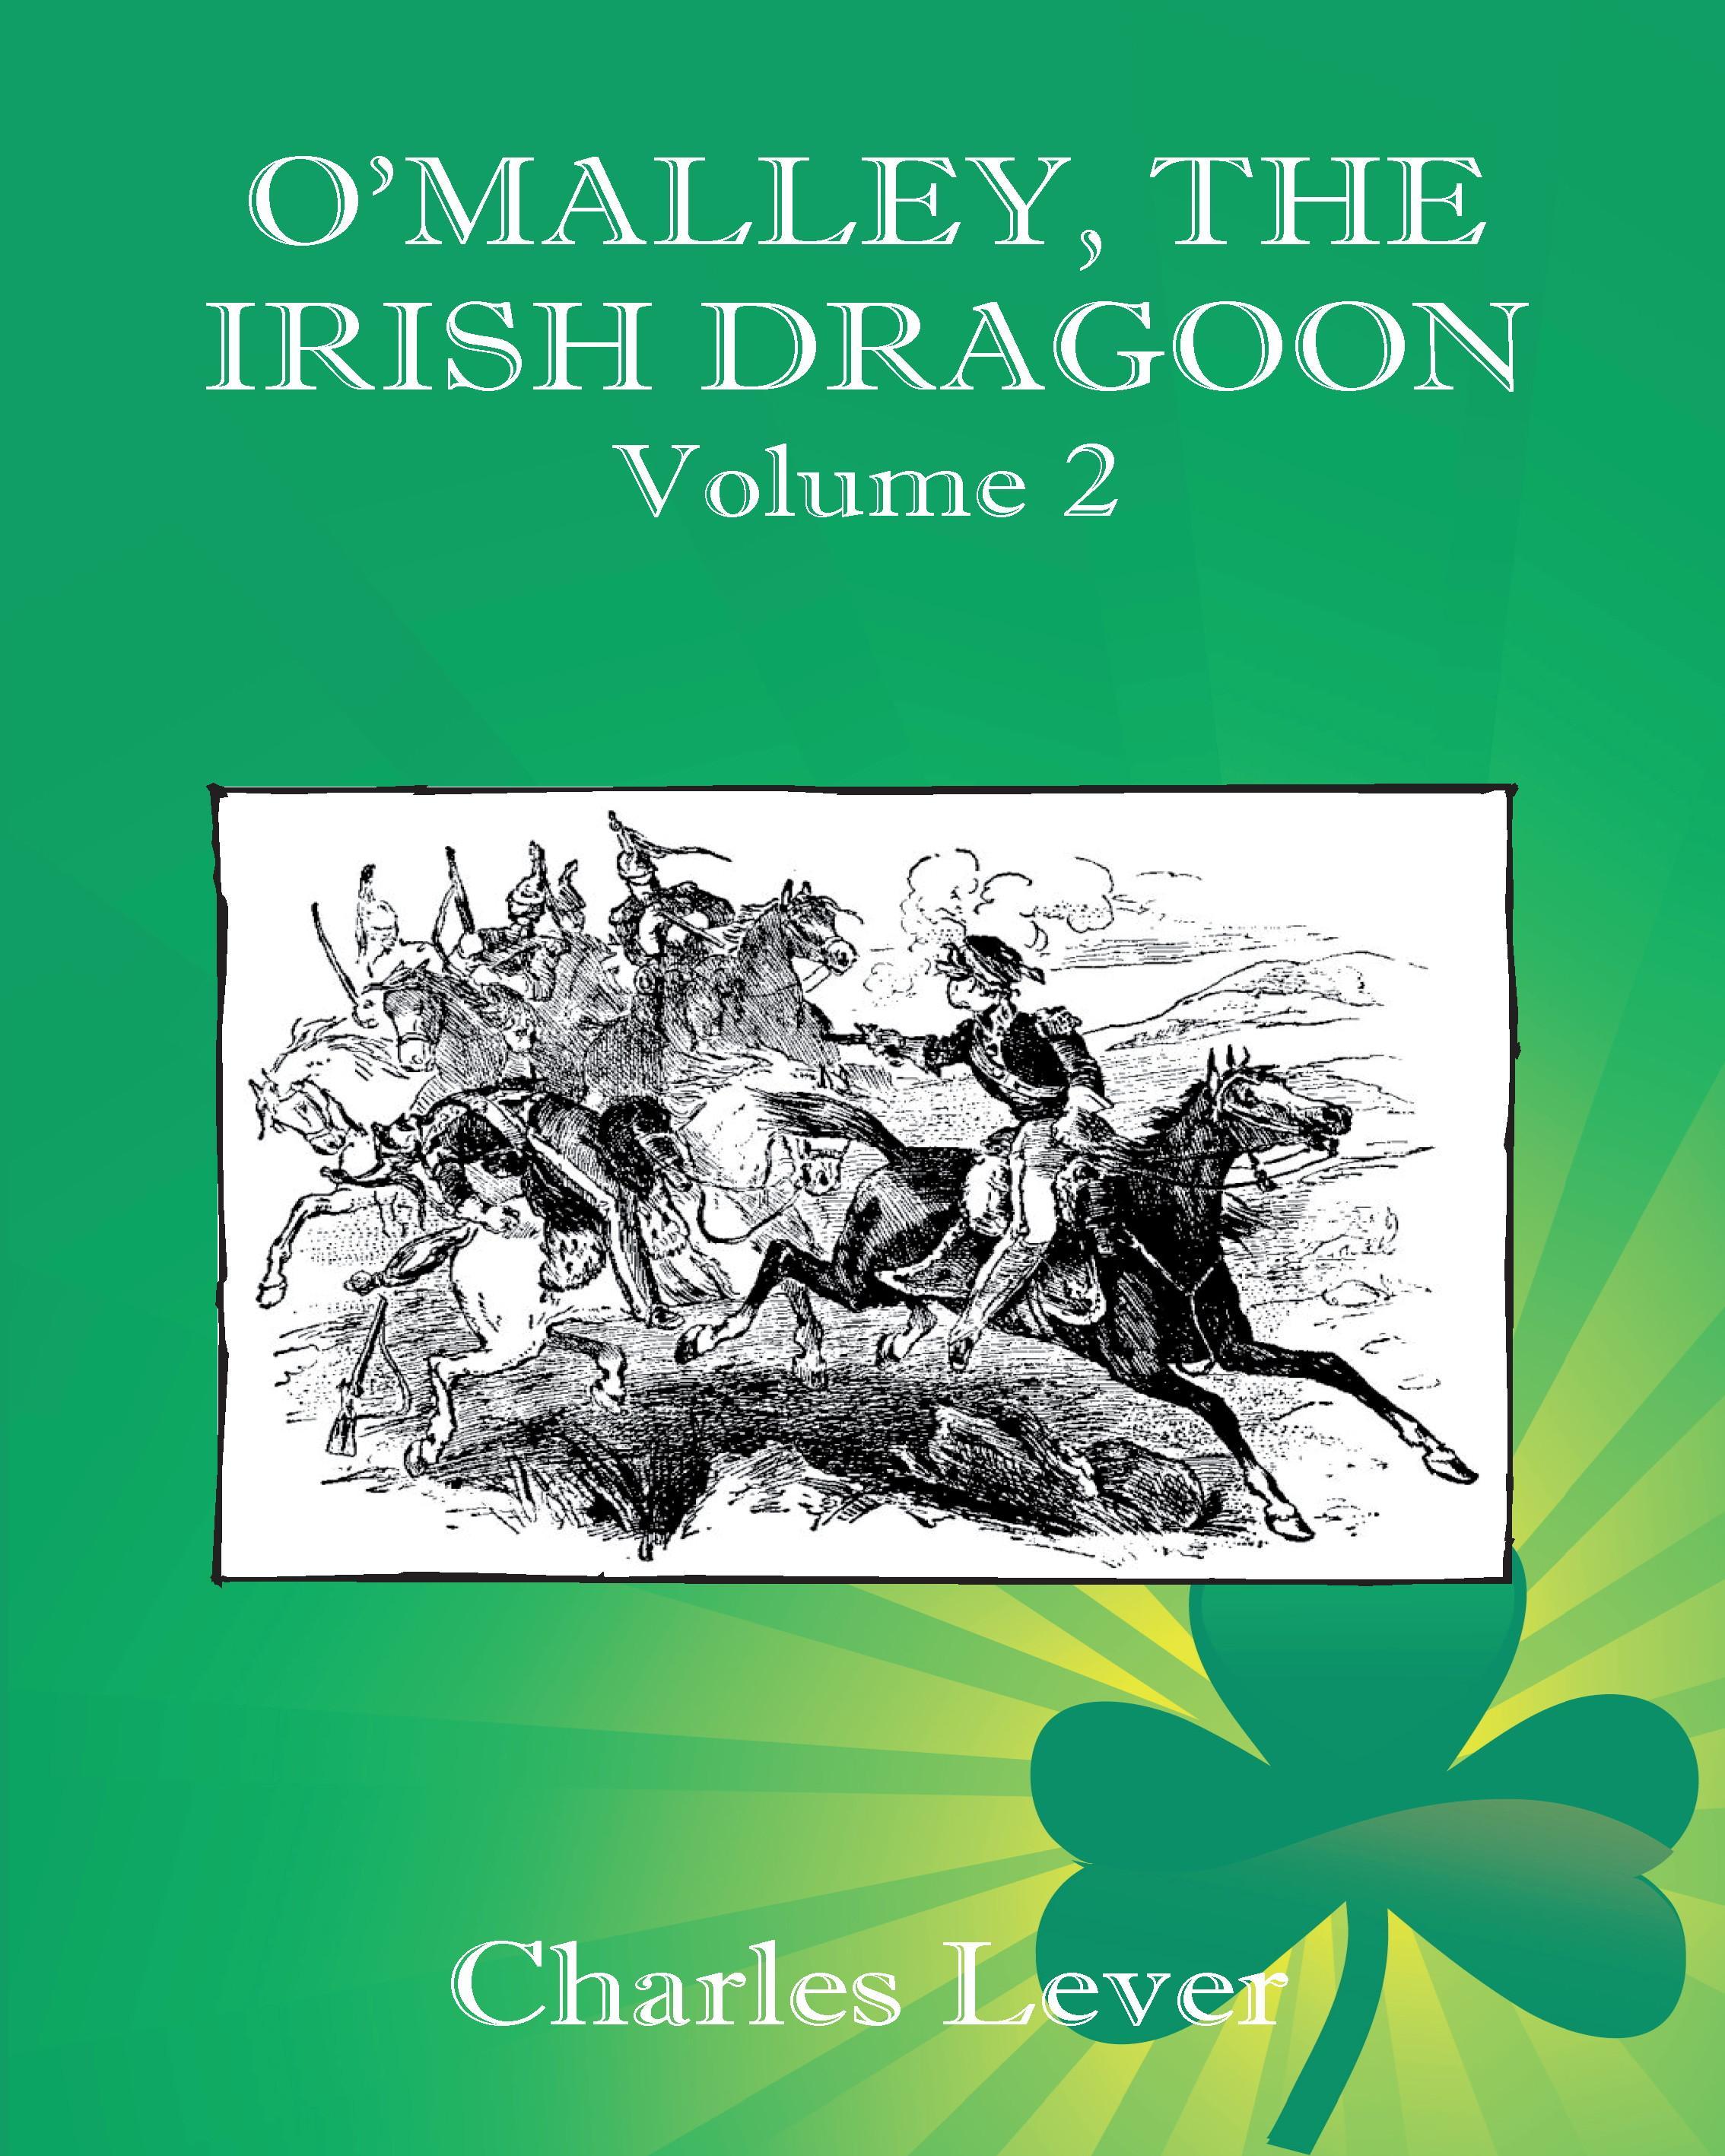 O'Malley, the Irish Dragoon - Vol. 2 EB9781611790764